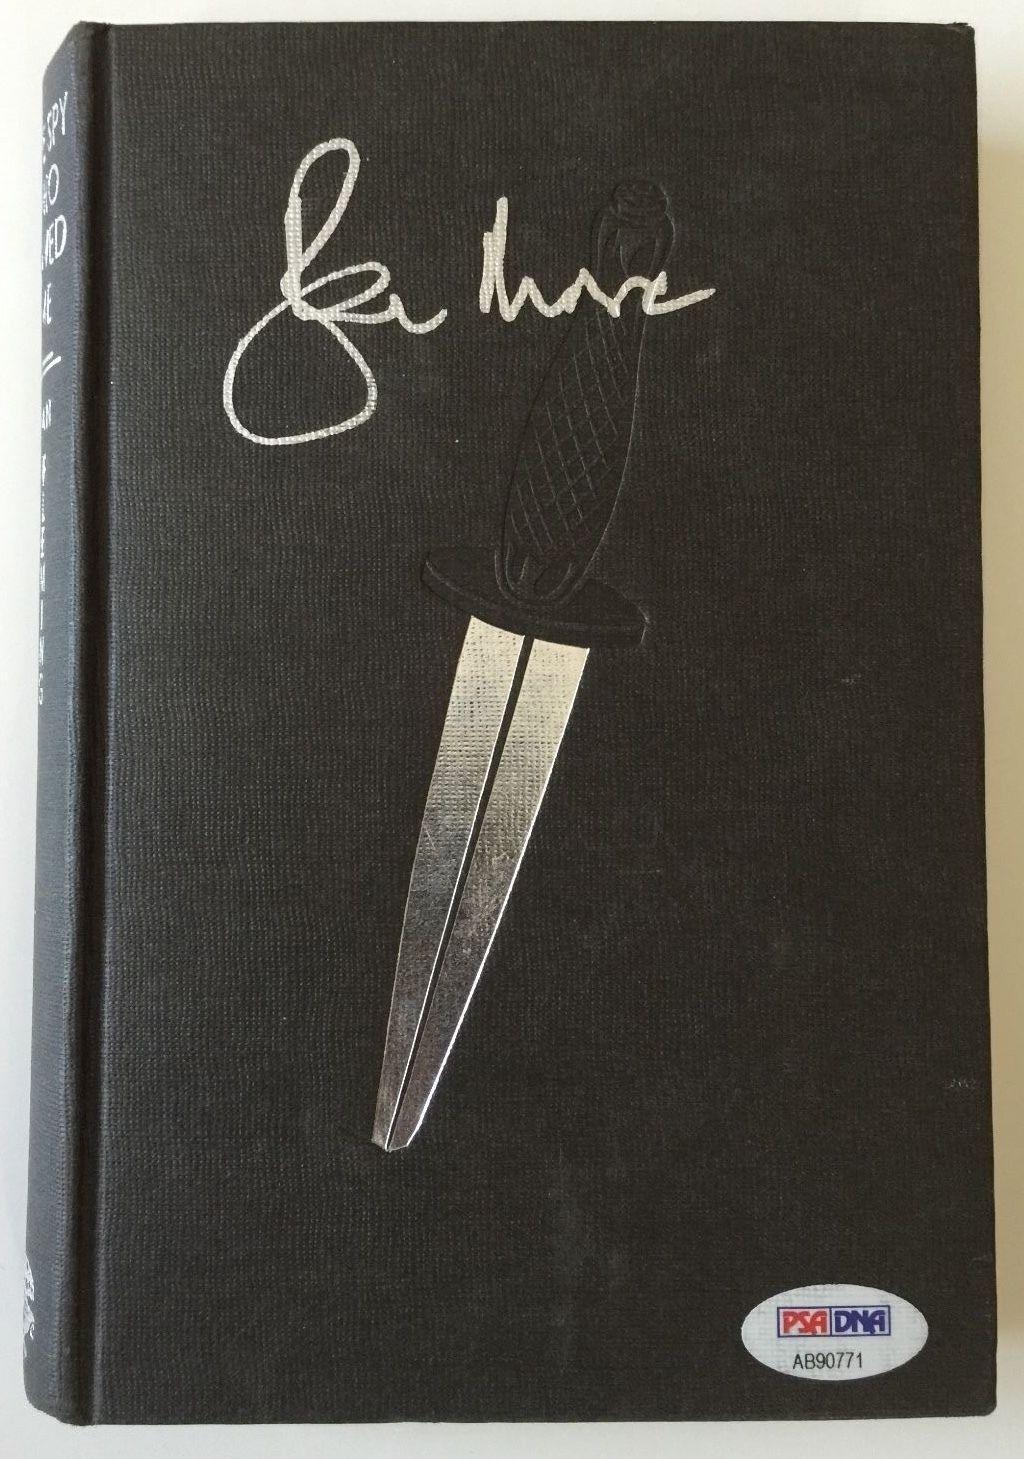 ROGER MOORE Signed JAMES BOND Spy Who Loved Me Ian Fleming HC Book PSA/DNA COA